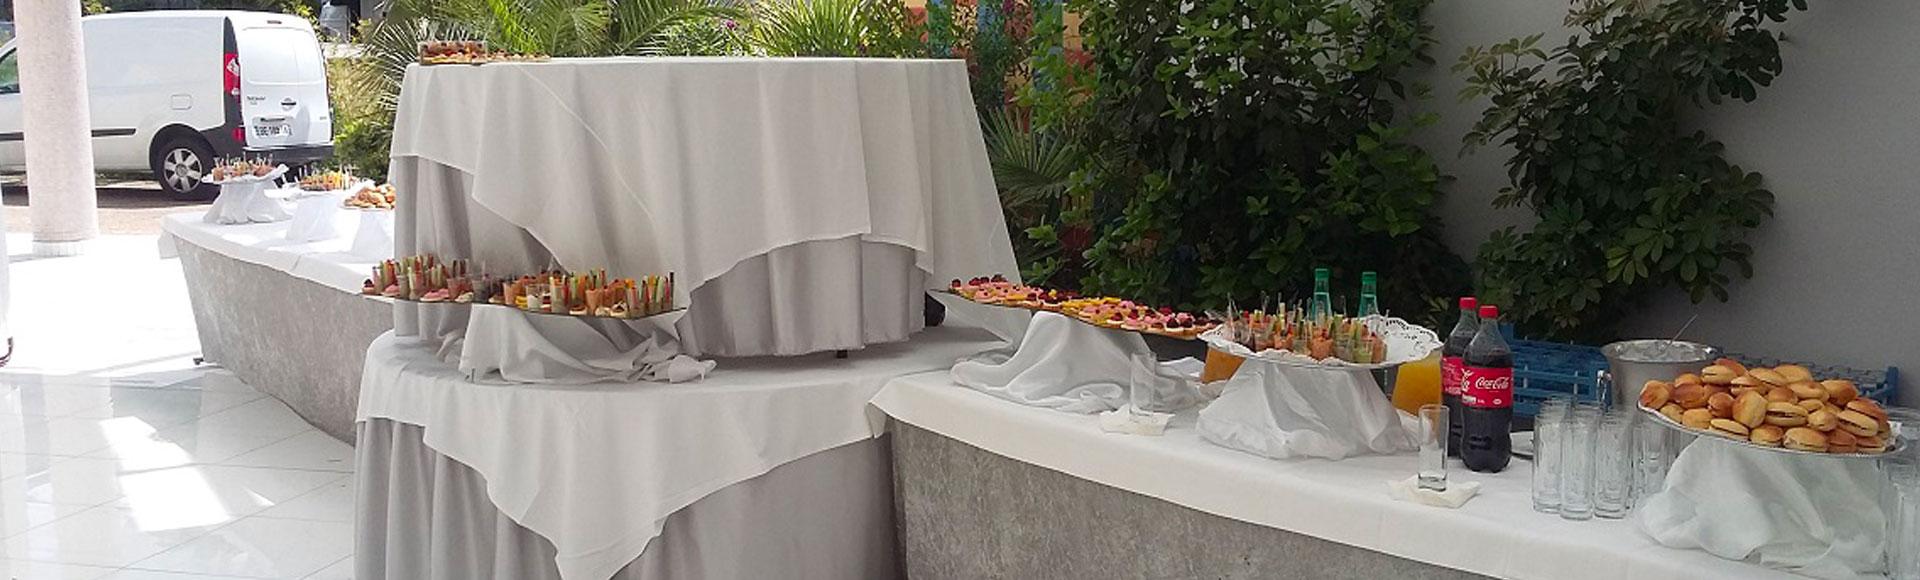 Terrasse buffet reception